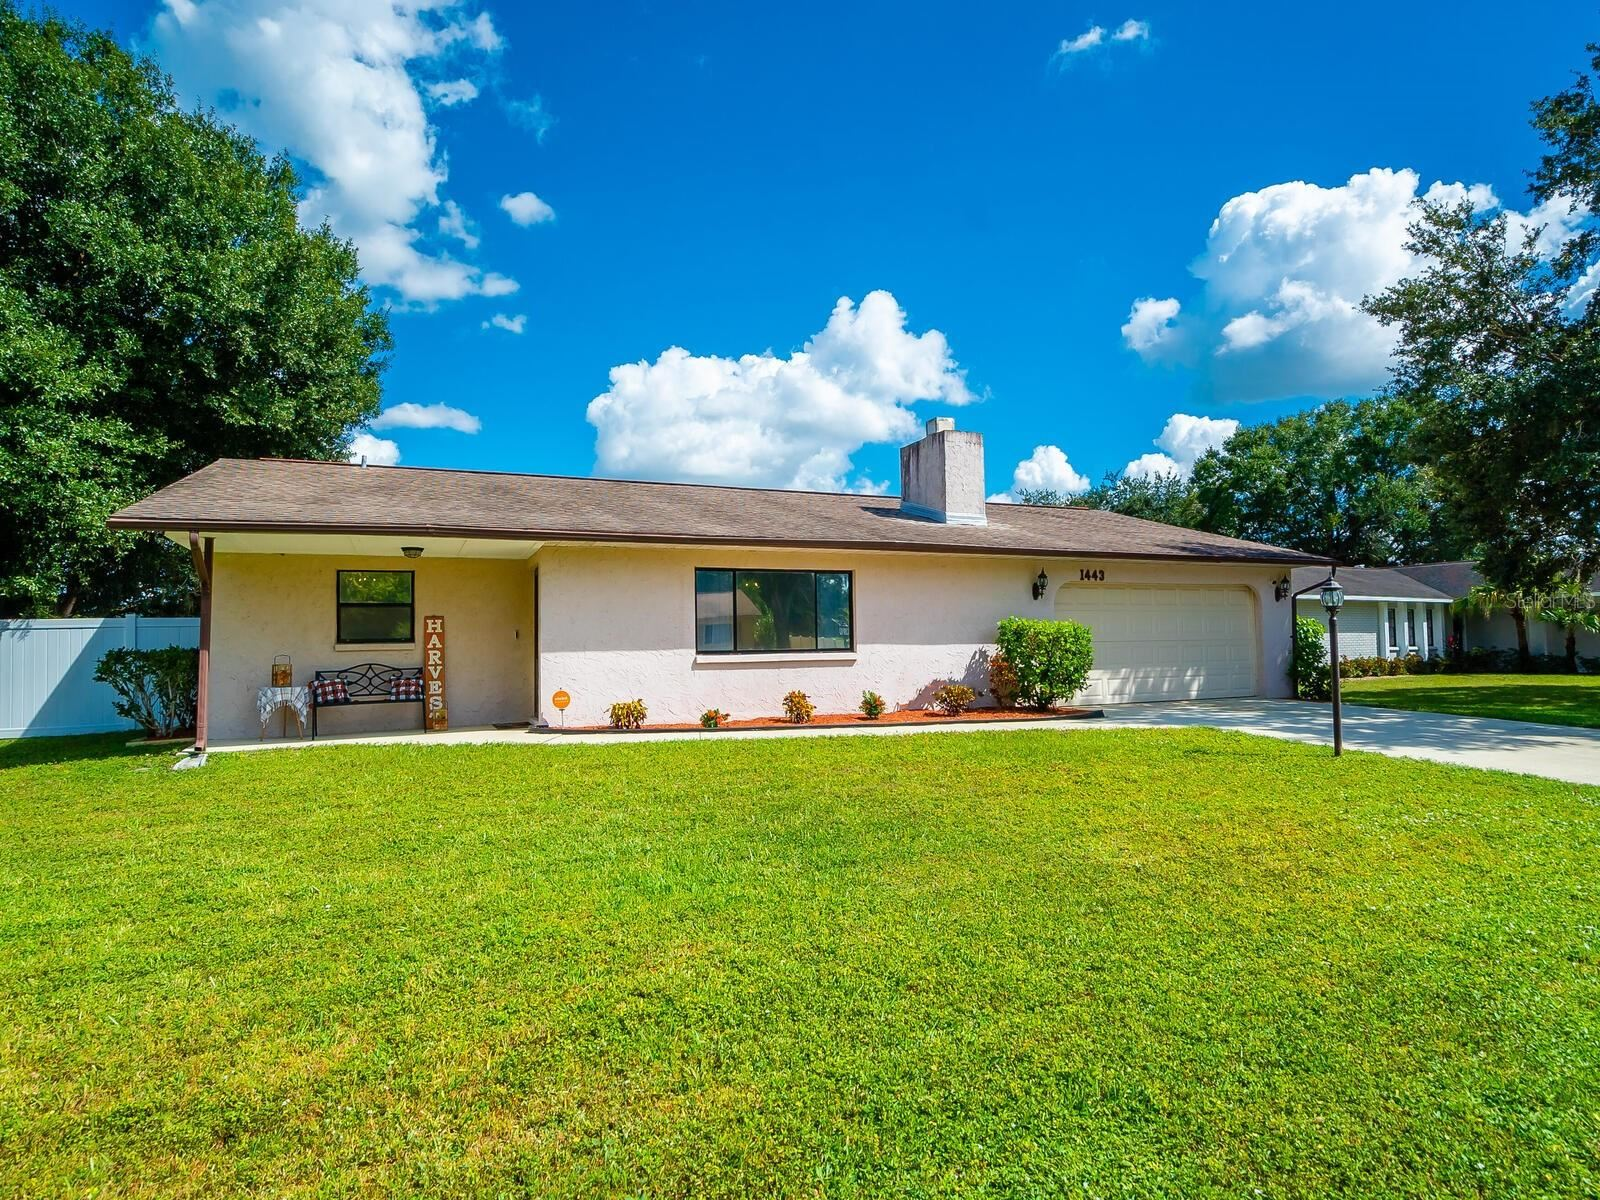 1443 GEORGETOWNE DRIVE, Sarasota, FL 34232 - #: A4515065